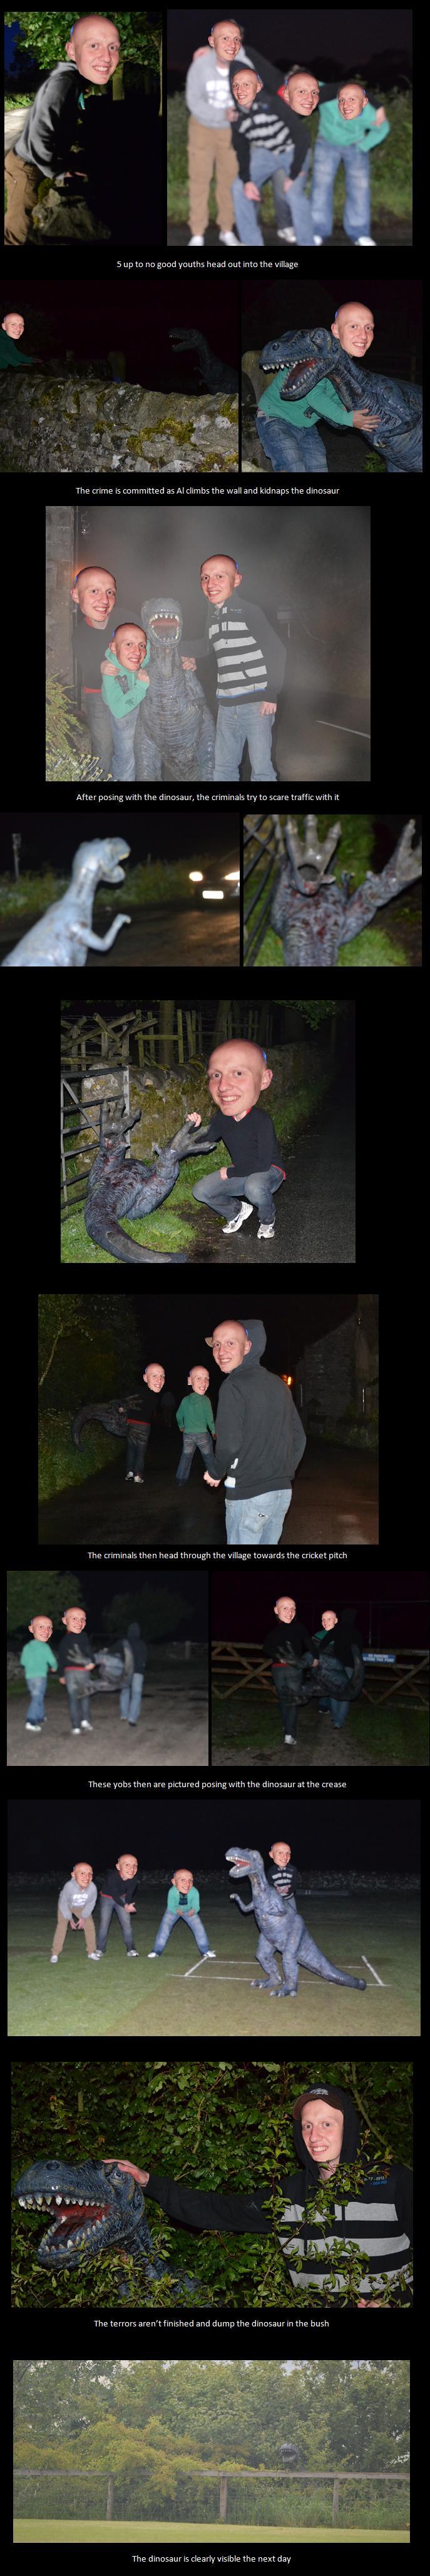 Dino Report